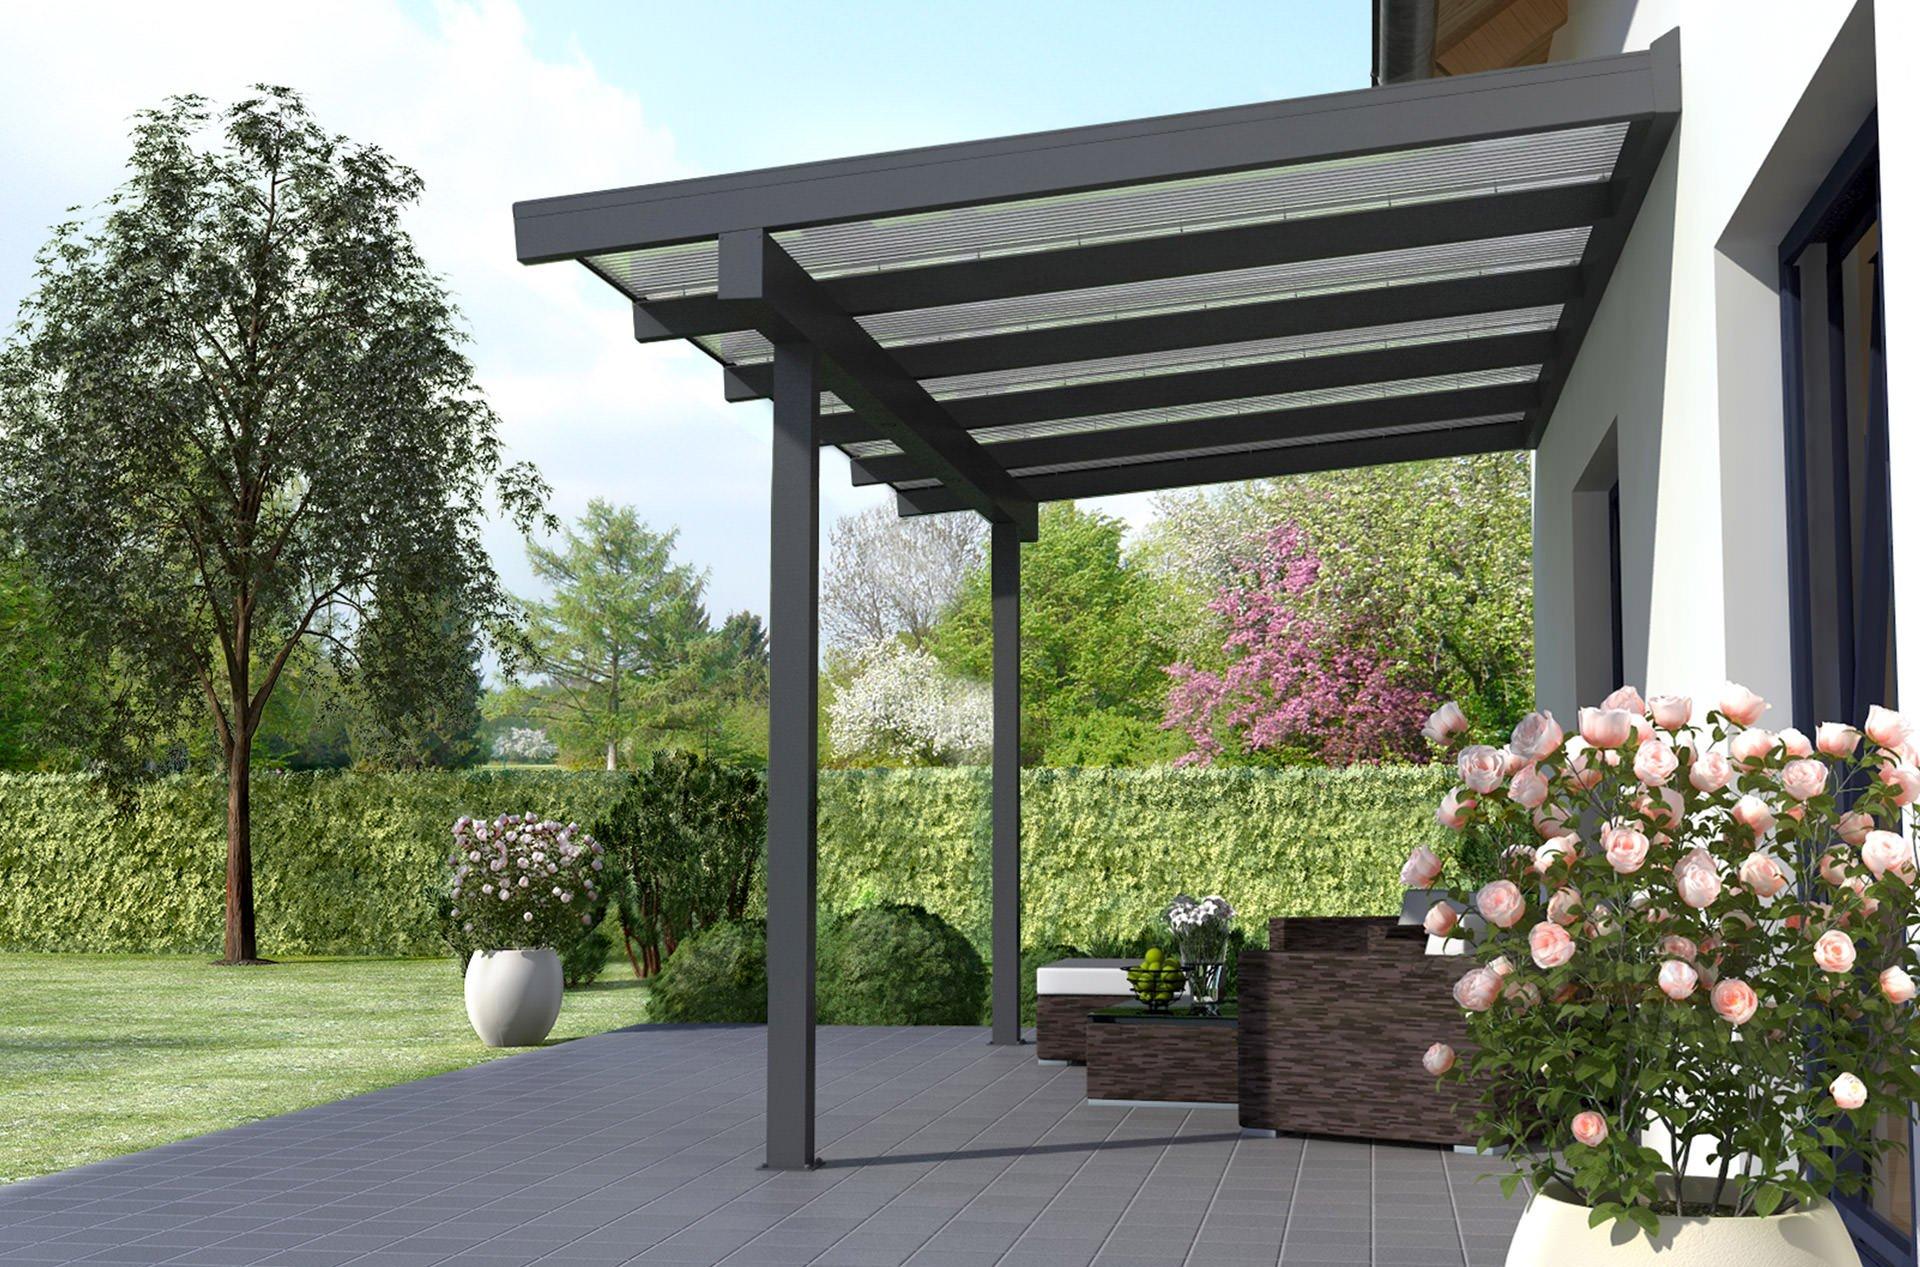 rexoclassic xxl alu terrassenüberdachung 8m x 3,50m ▷ rexin-shop, Hause deko